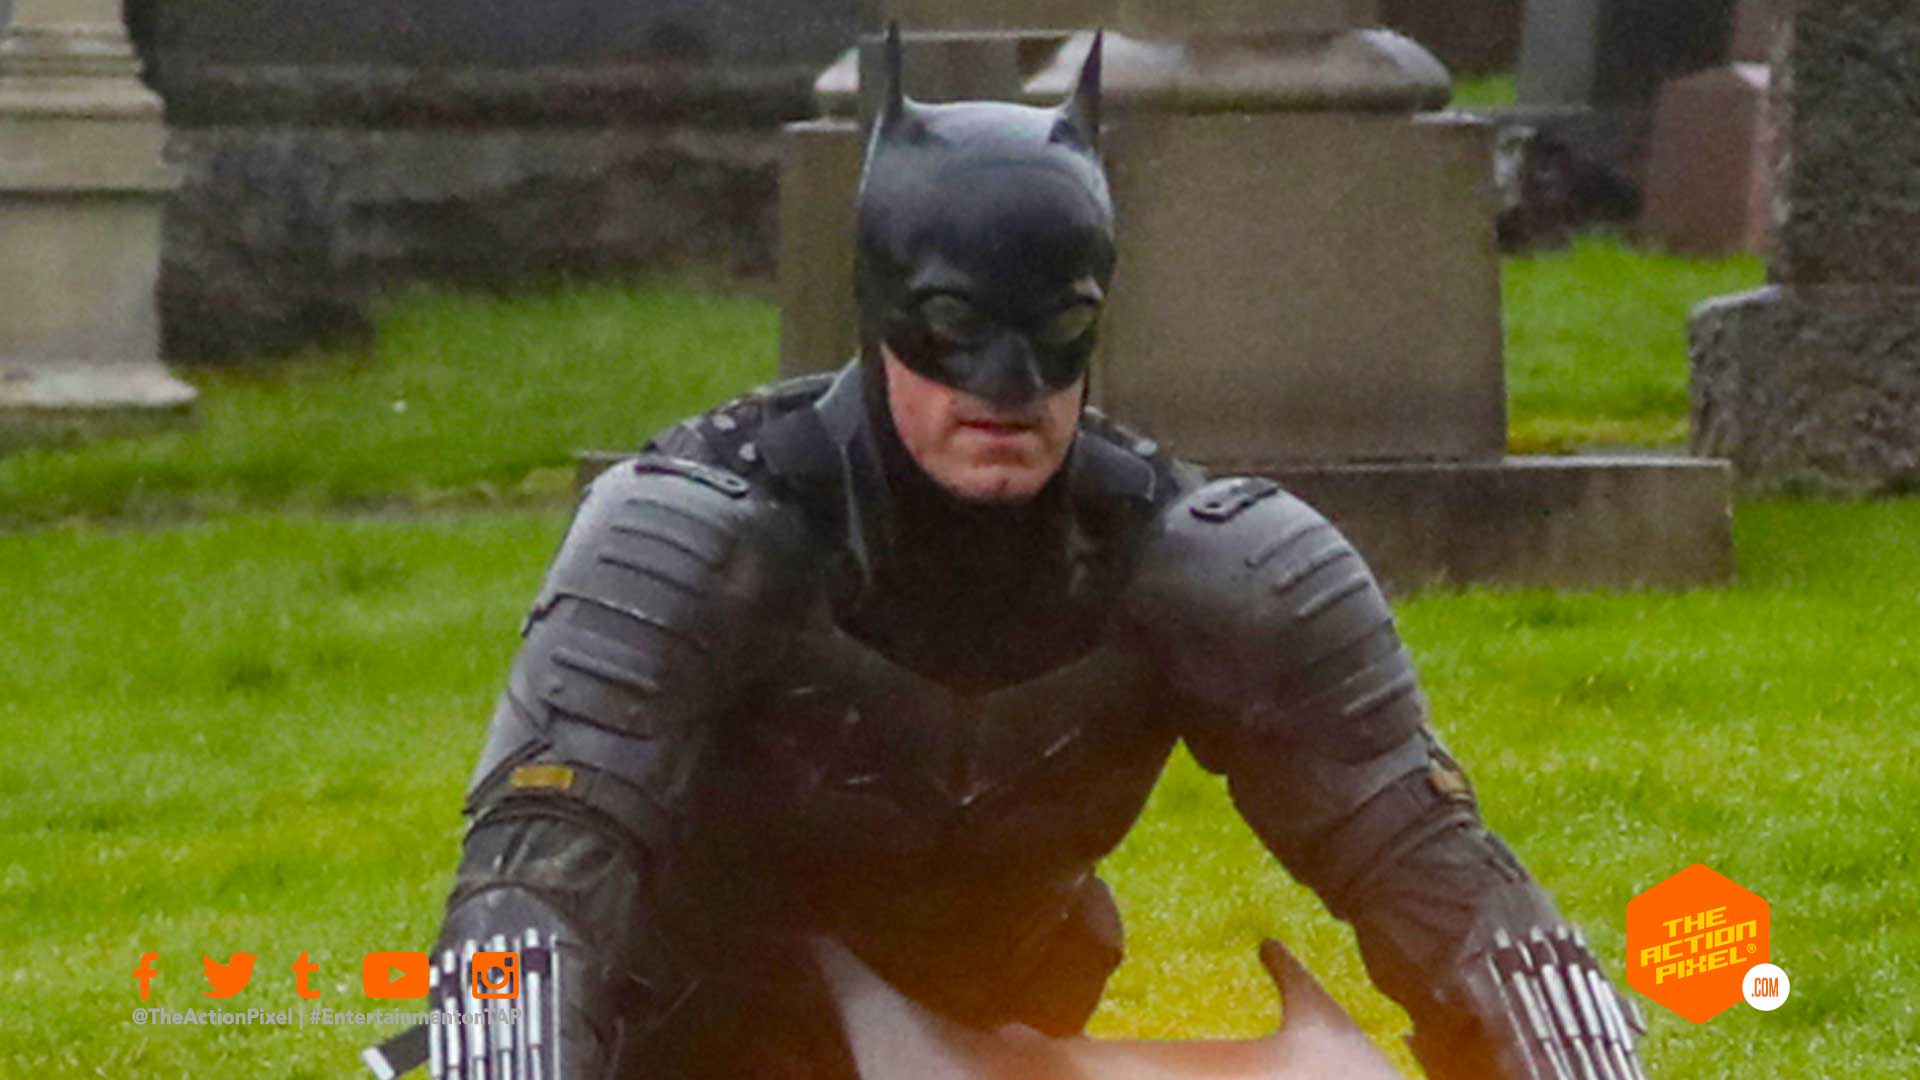 batman, the batman, matt reeves, dc comics, dc entertainment, the batman test video, robert pattinson the batman, the action pixel, entertainment on tap, featured, warner bros. pictures, the batman movie,